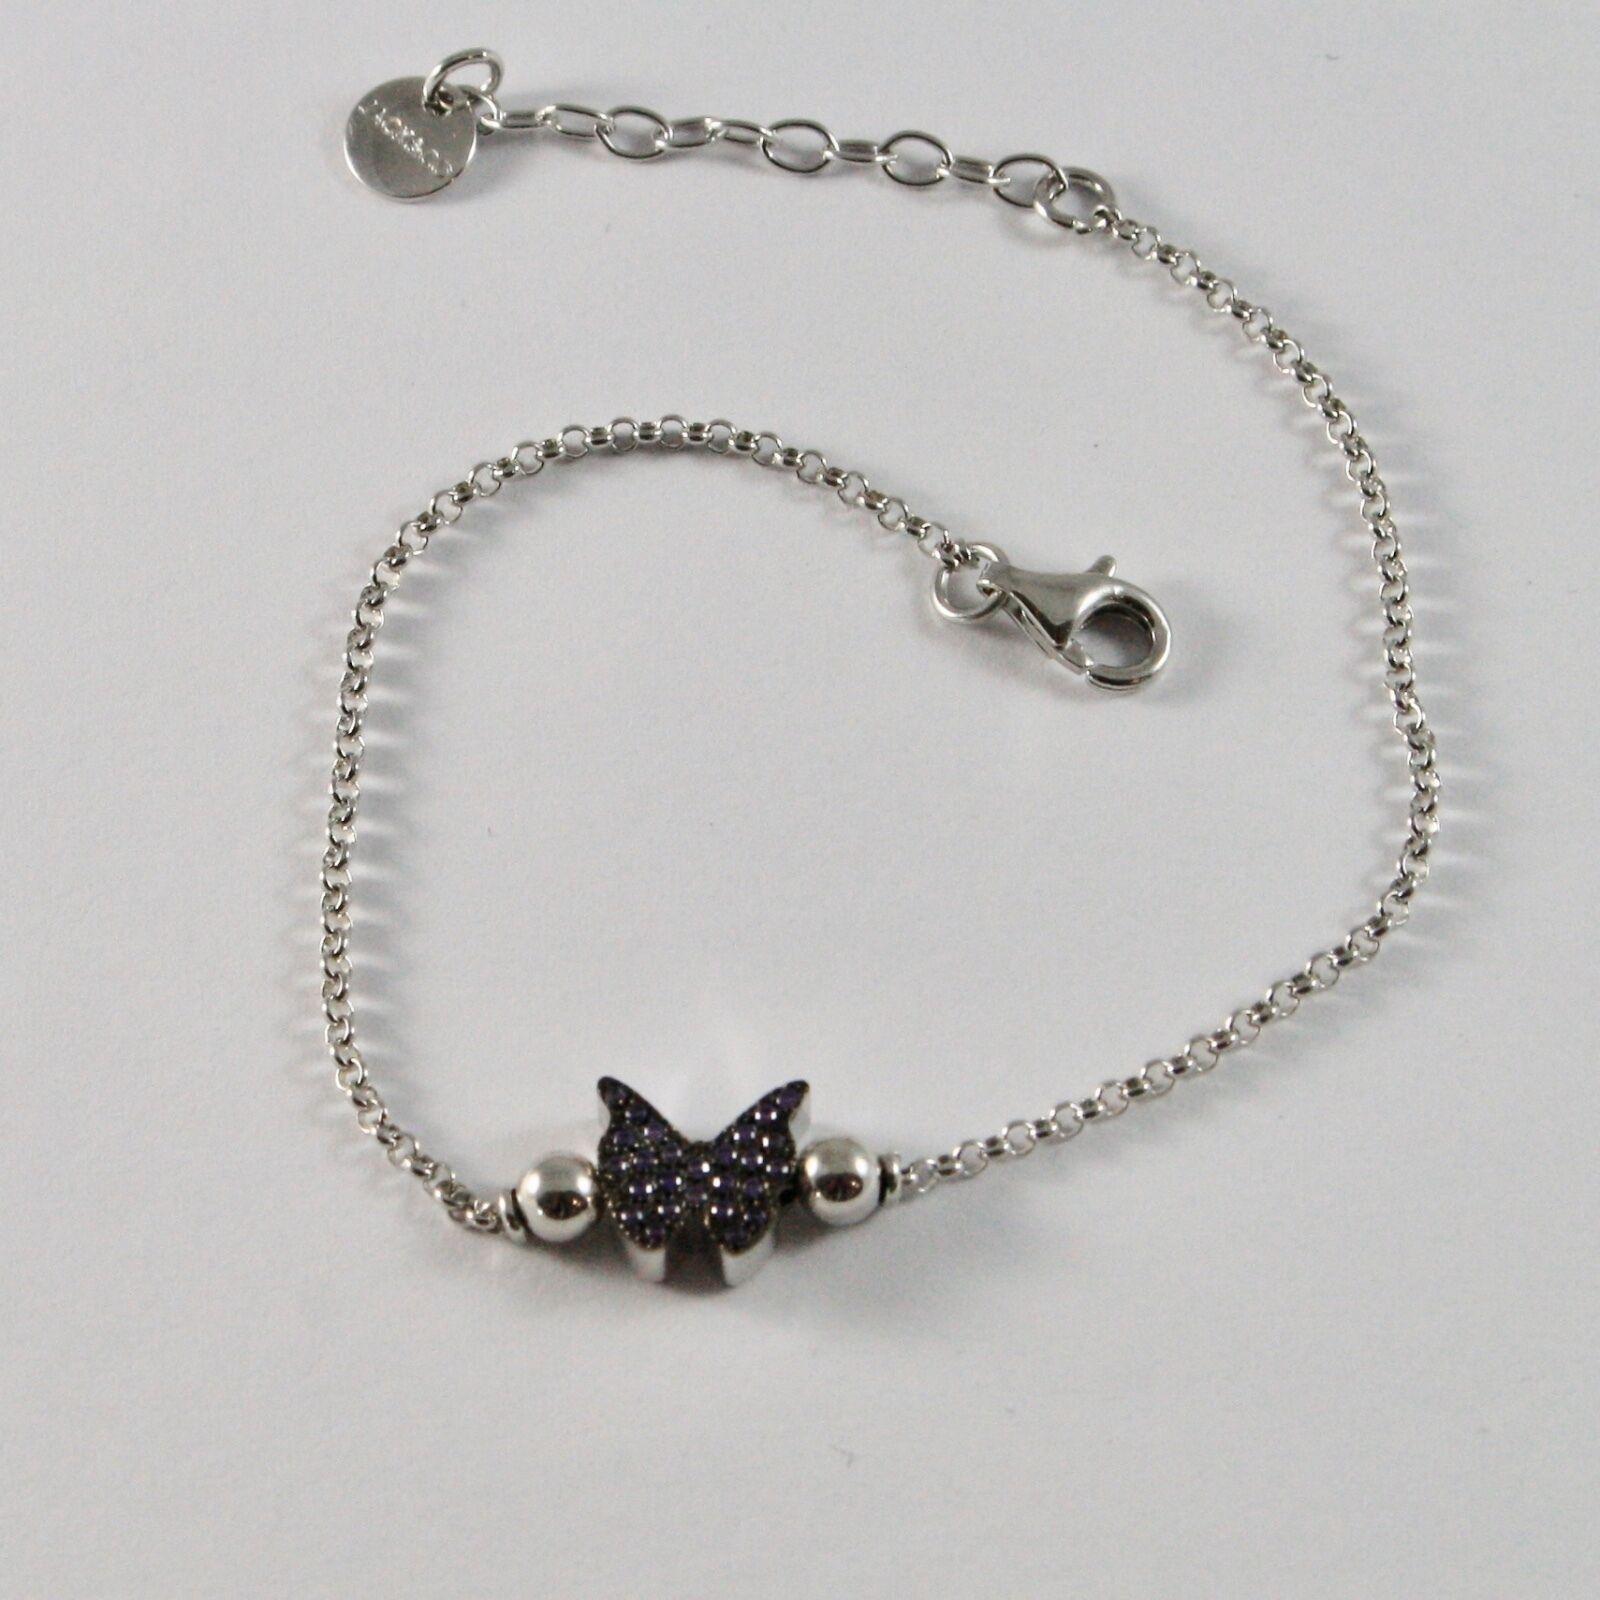 Silber Armband 925 Jack&co mit Schmetterling Stilisiert Zirkonia Cubic JCB0886